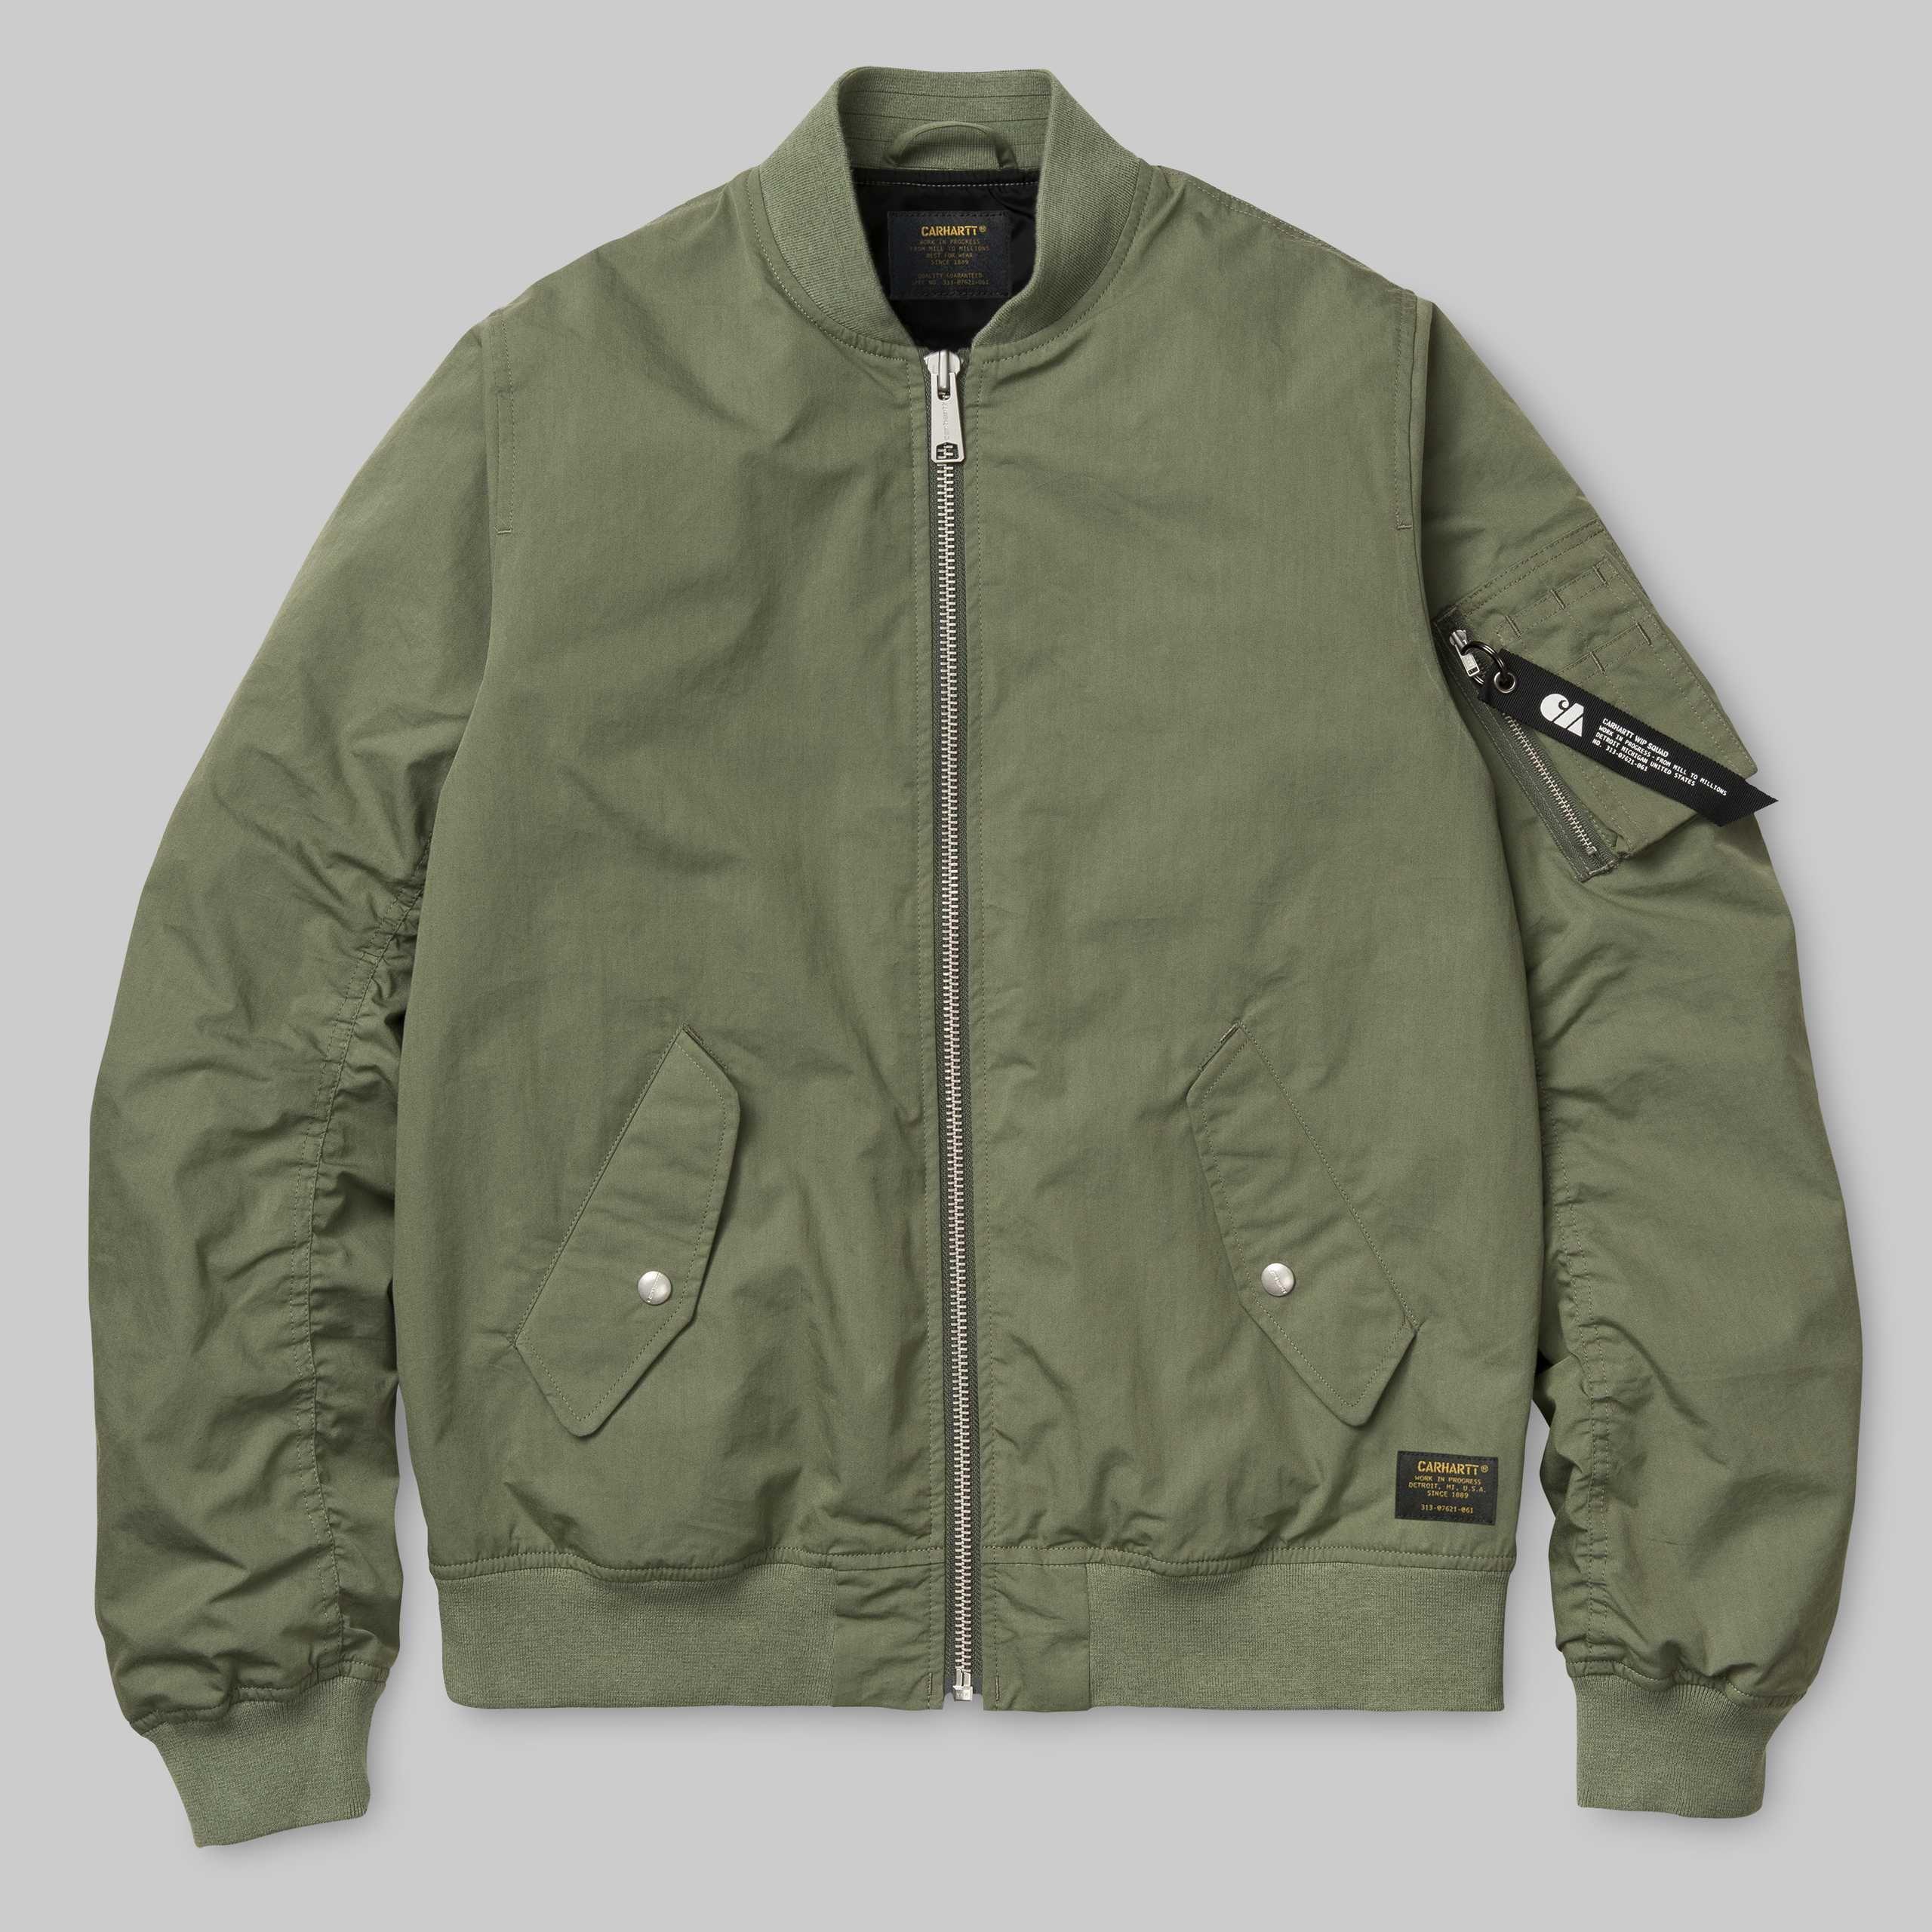 891d7695ed137 Carhartt WIP Adams Jacket